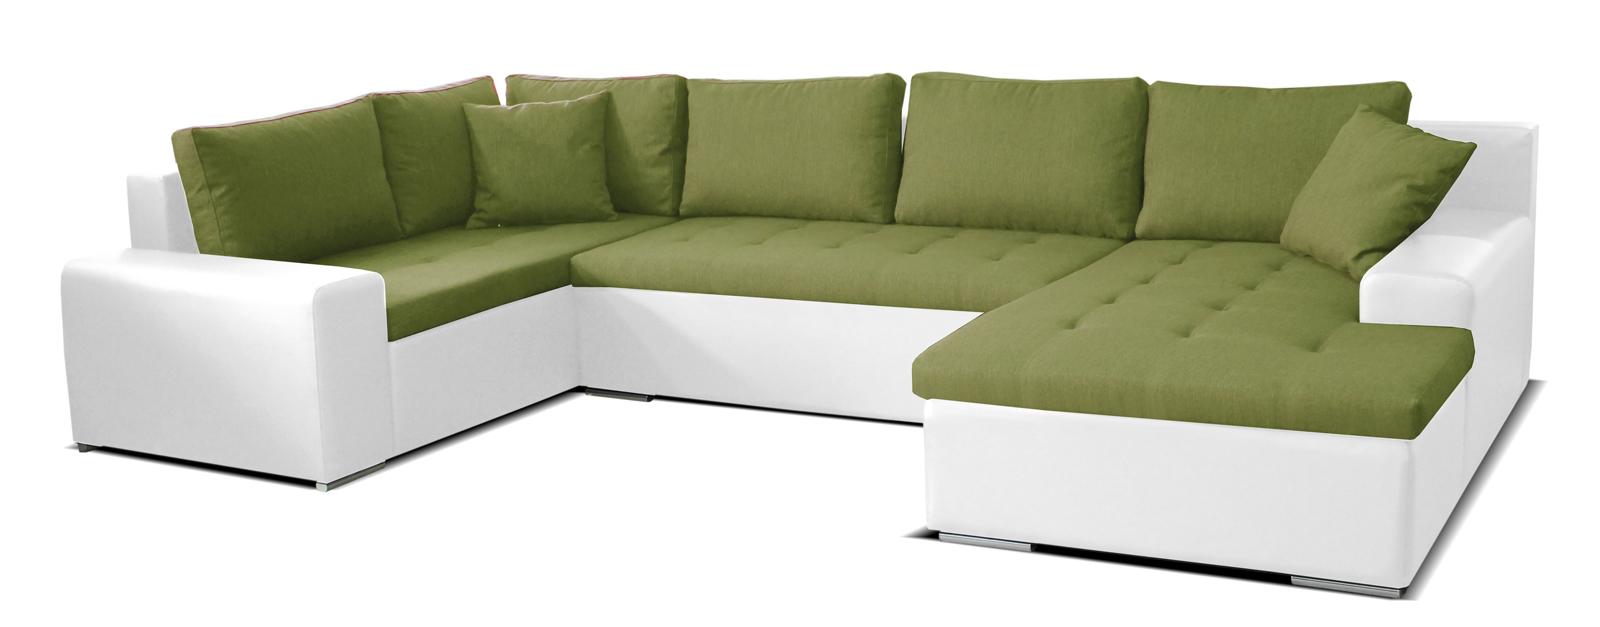 Rohová sedací souprava U - Po-Sed - Moreno BL+2+L (zelená + bílá) (P)